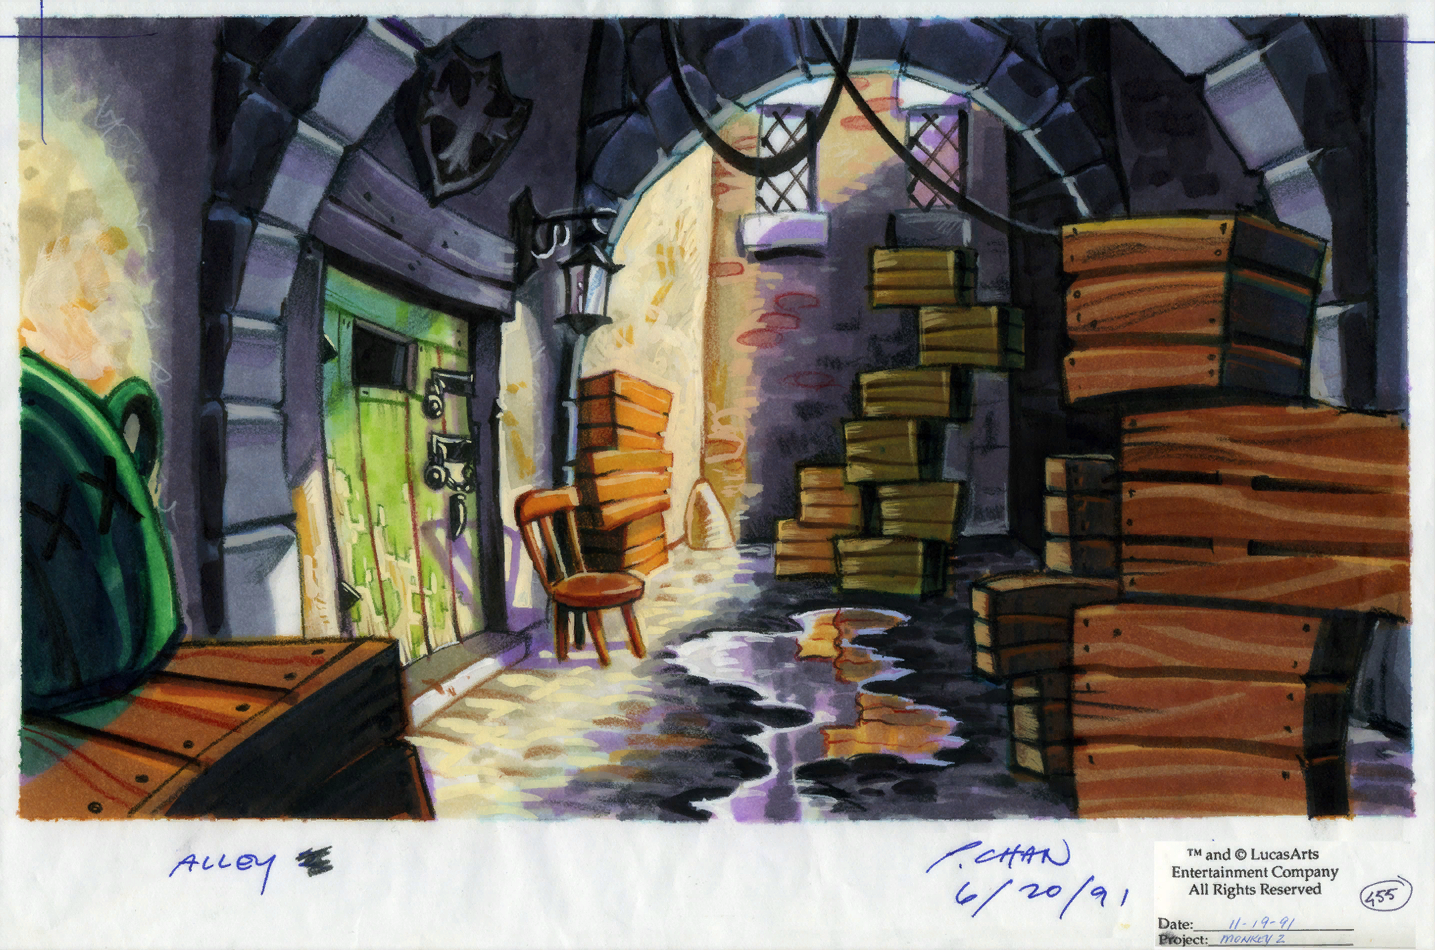 Monkey island 2 lechuck s revenge concept art the international - Original Background Drawing For The Gambler S Club Doorway